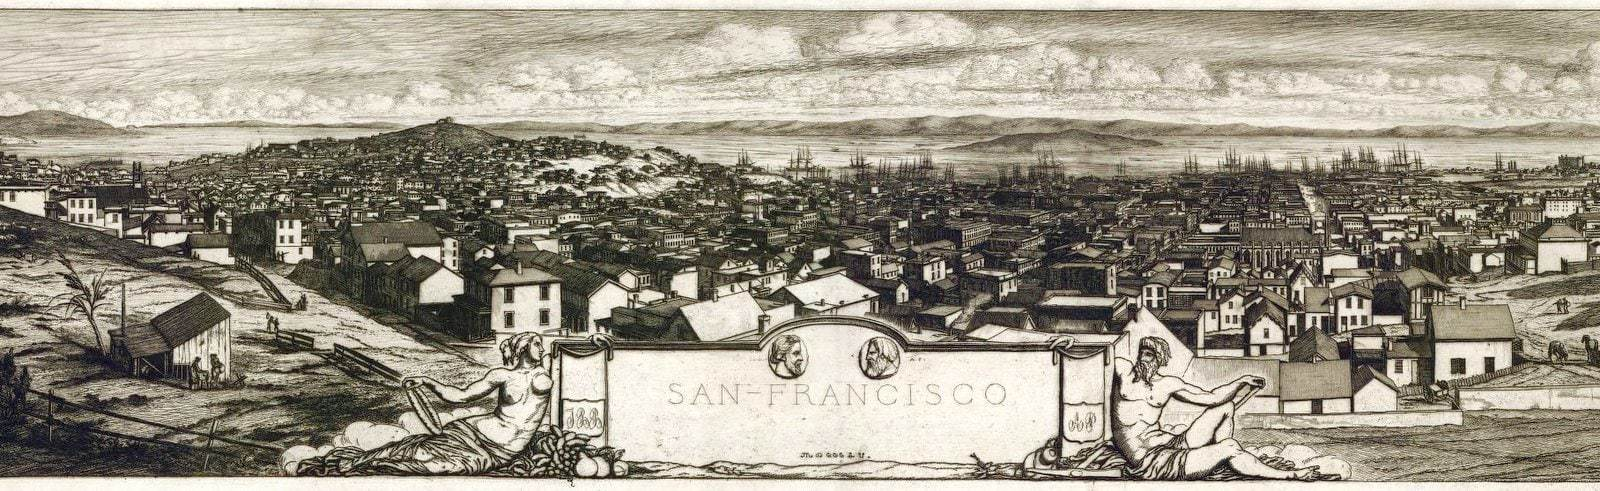 San Francisco 1856